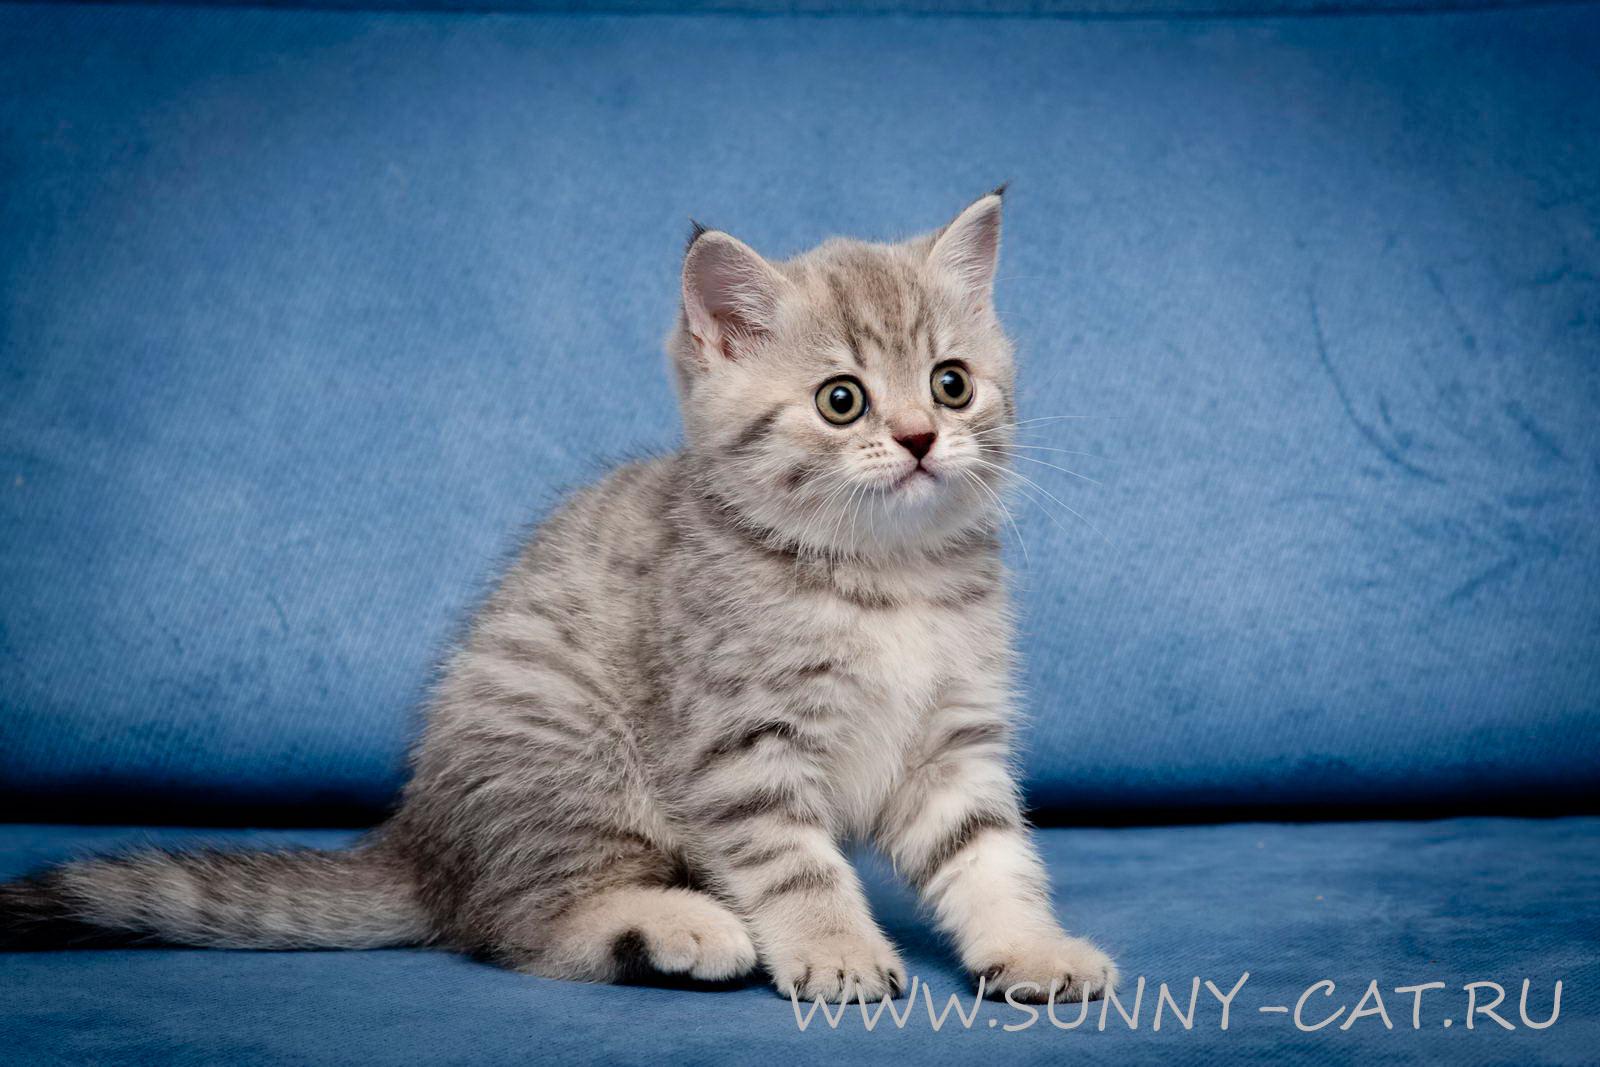 Табби тэбби окрас британской кошки  Окрасы Британцев